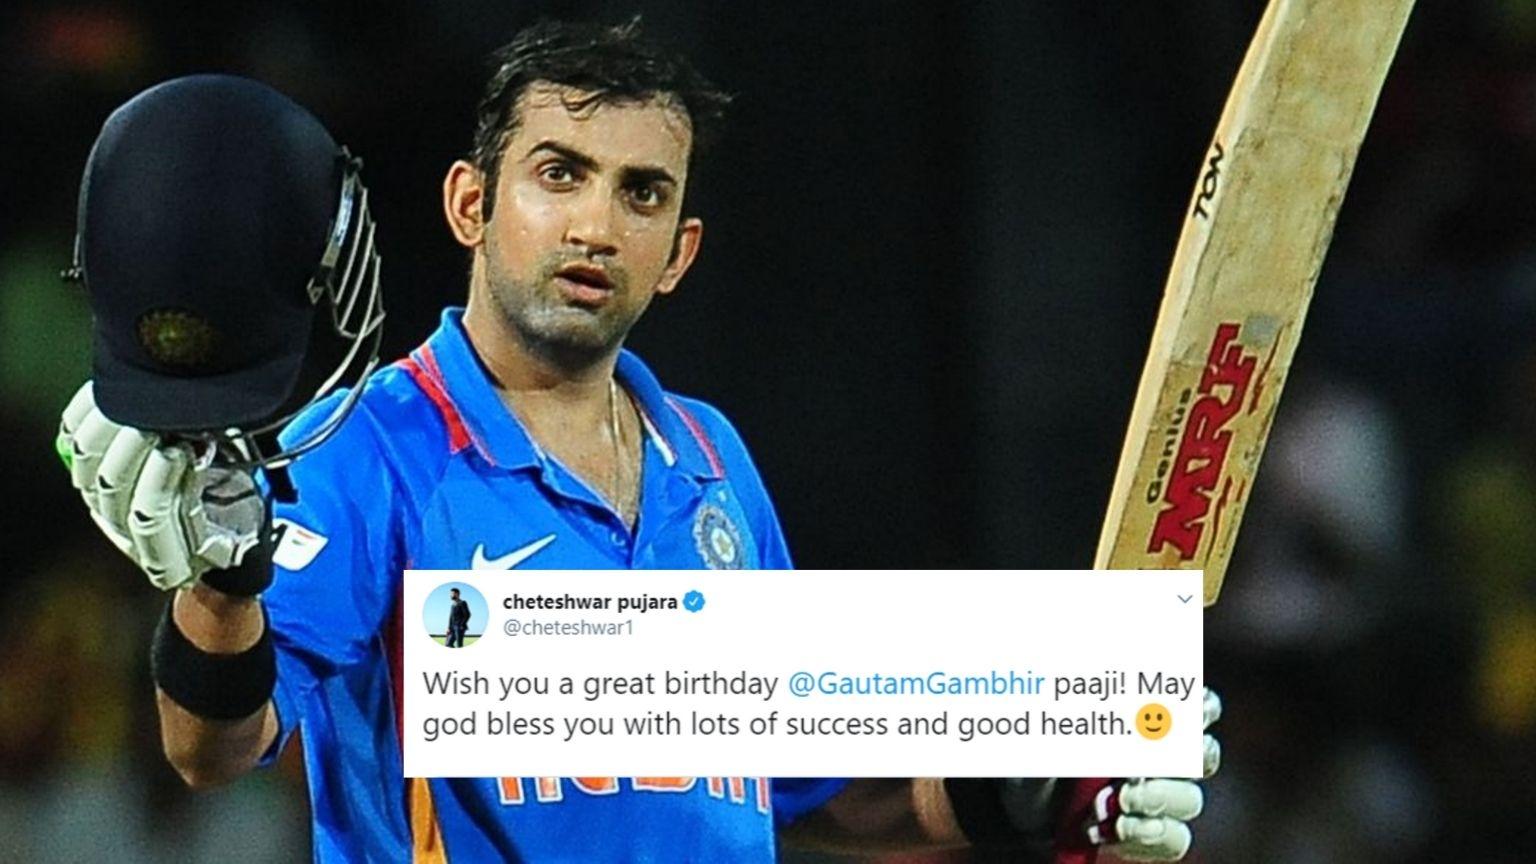 Cricket Fraternity Wishes Gautam Gambhir on His 38th Birthday